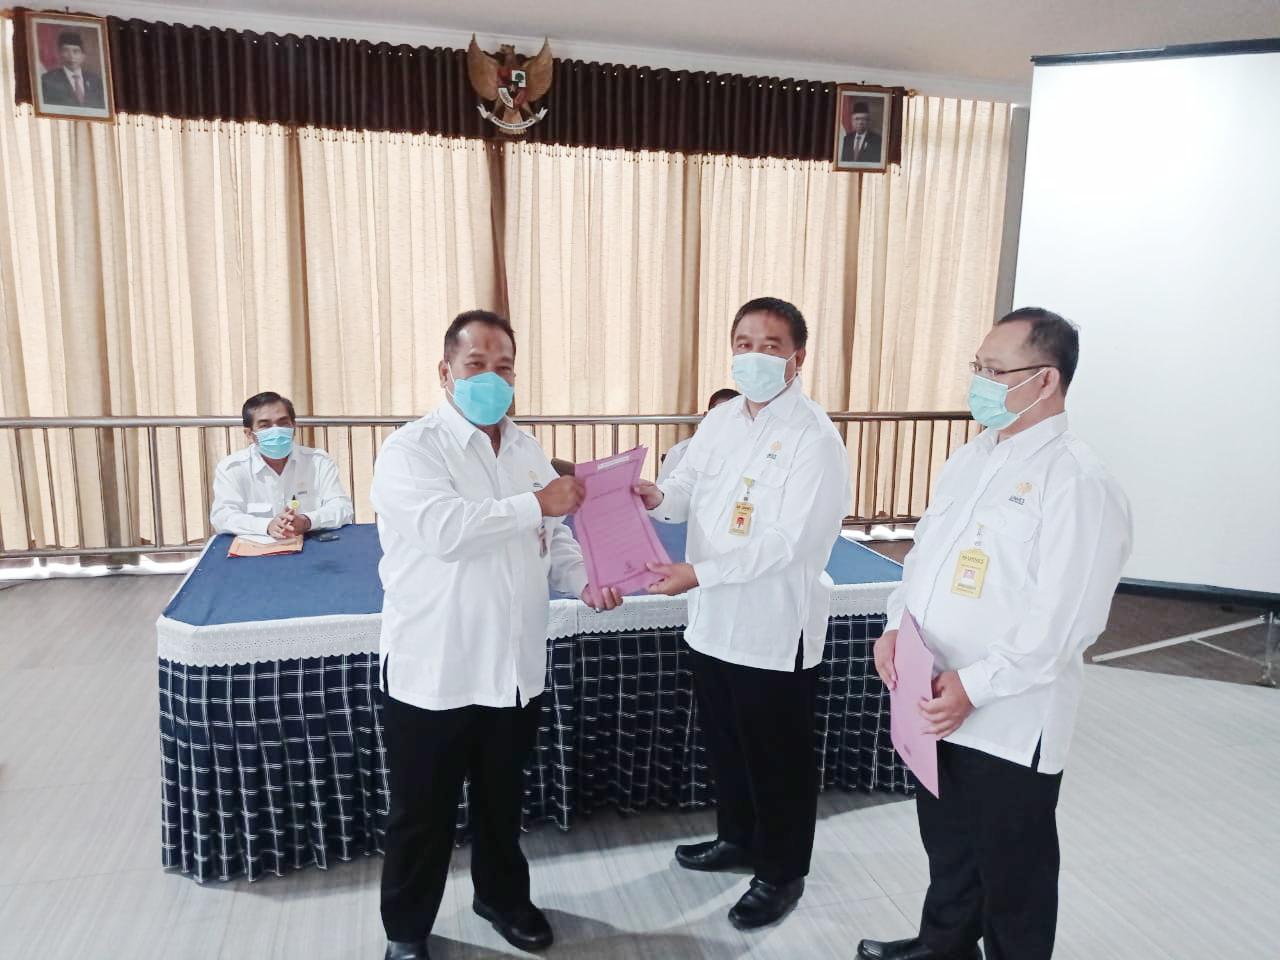 Dr Yusro Edy Nugroho SS MHum Dilantik Jadi Kepala UPT Perpustakaan